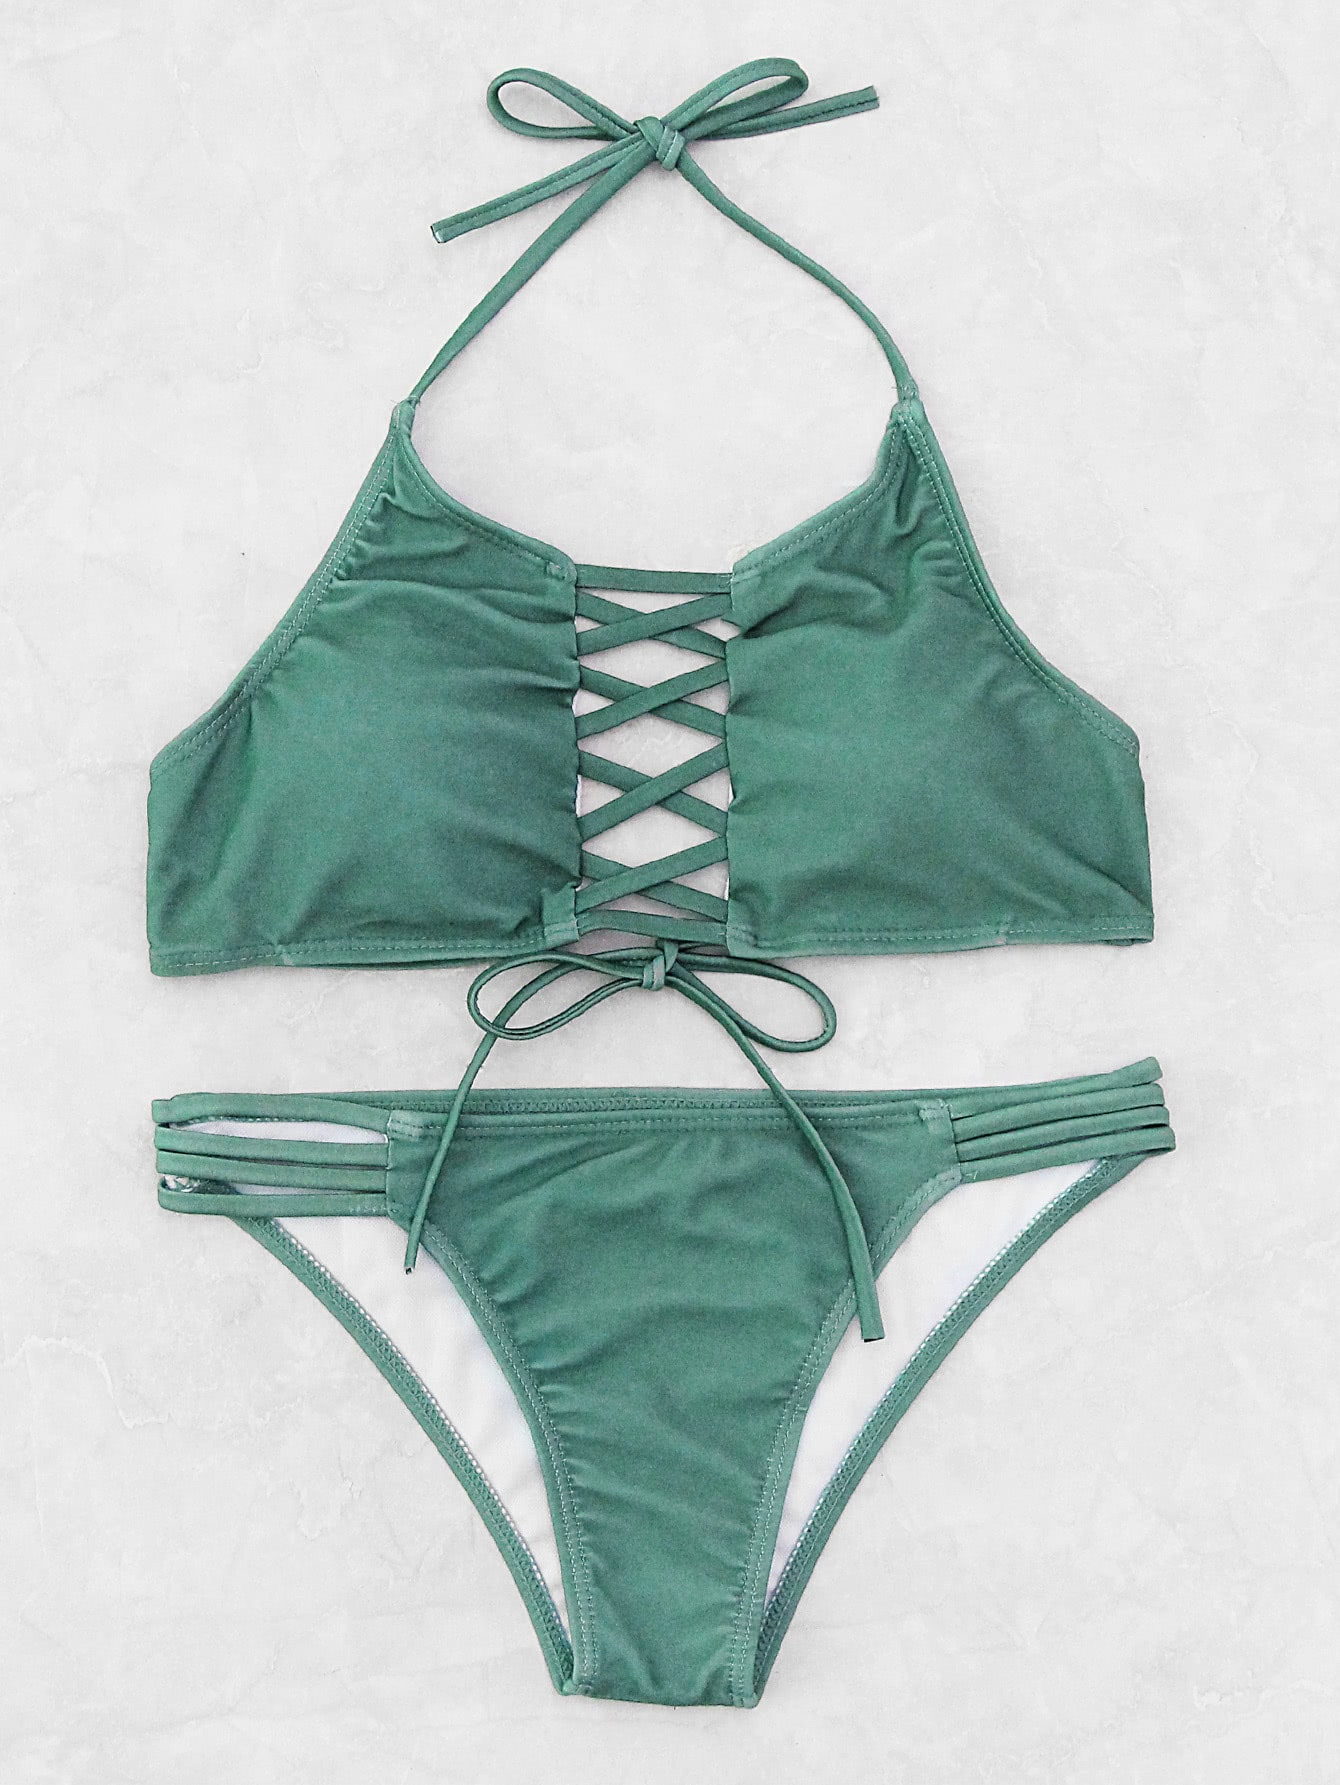 Criss Cross Ladder Cutout Halter Bikini Set swimwear170630313